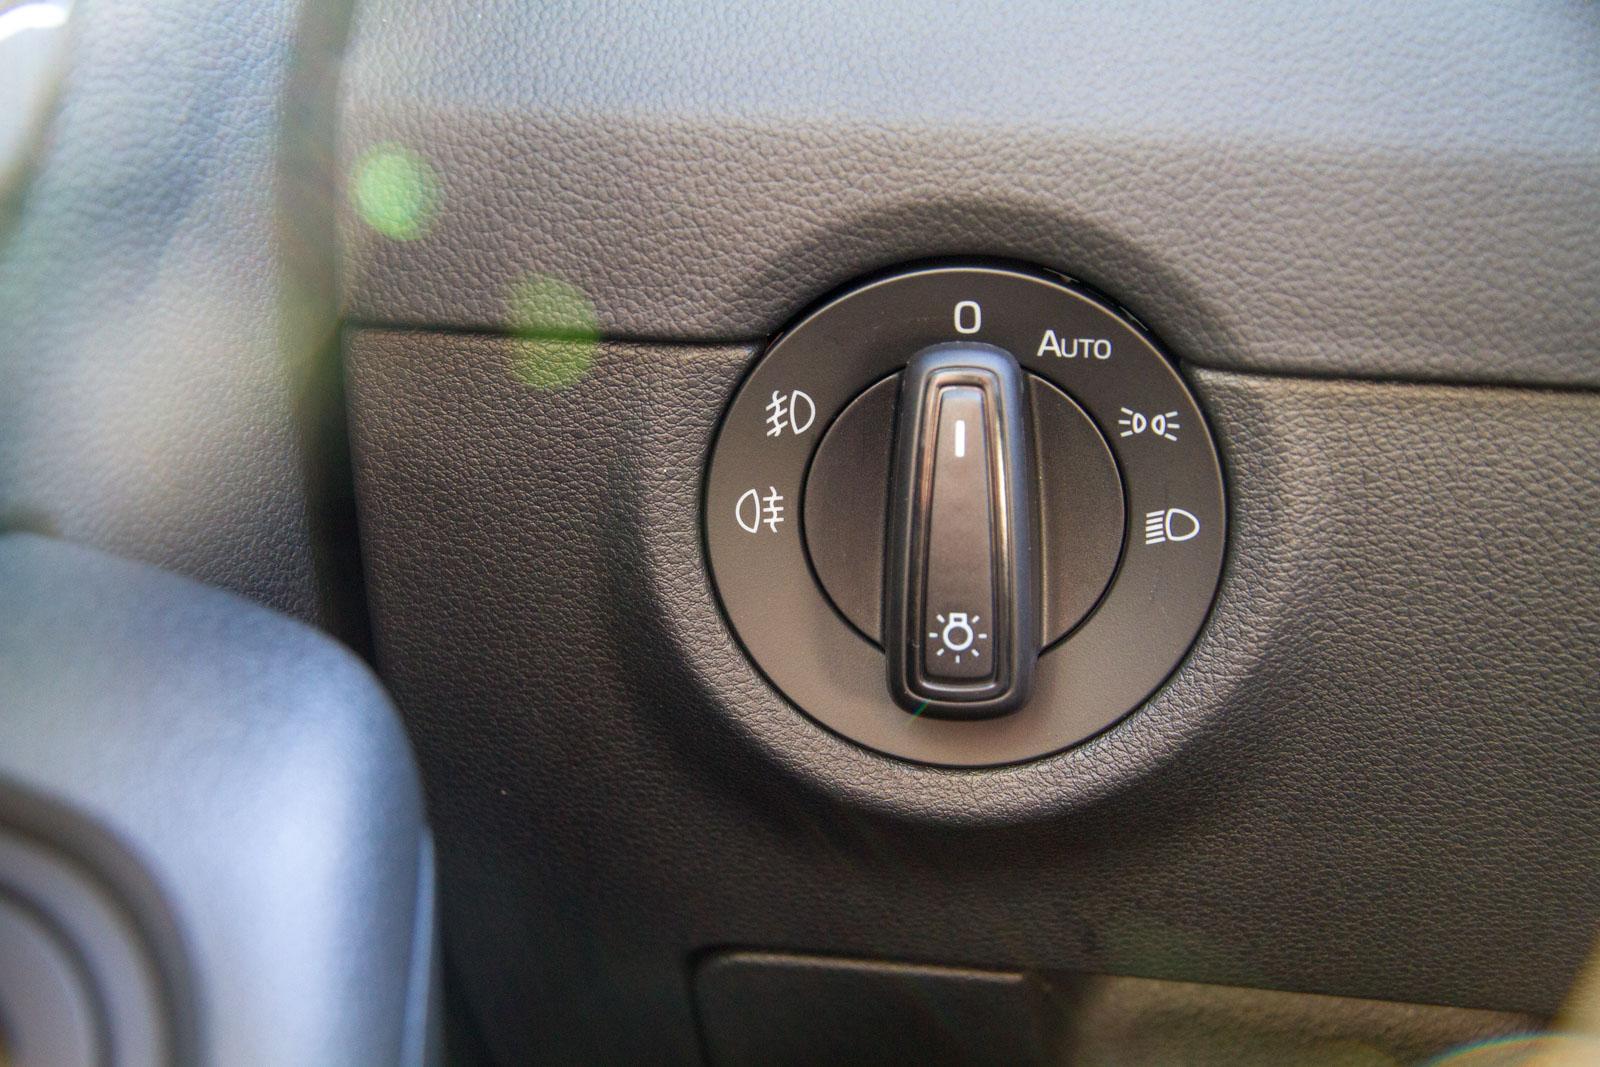 Skoda Octavia Kombi Ambition Benziner 1.4 TSI 6-Gang / Deutsche Neufahrzeuge und EU-Neufahrzeuge – Aha! Fahrzeughandel GmbH in Althengstett